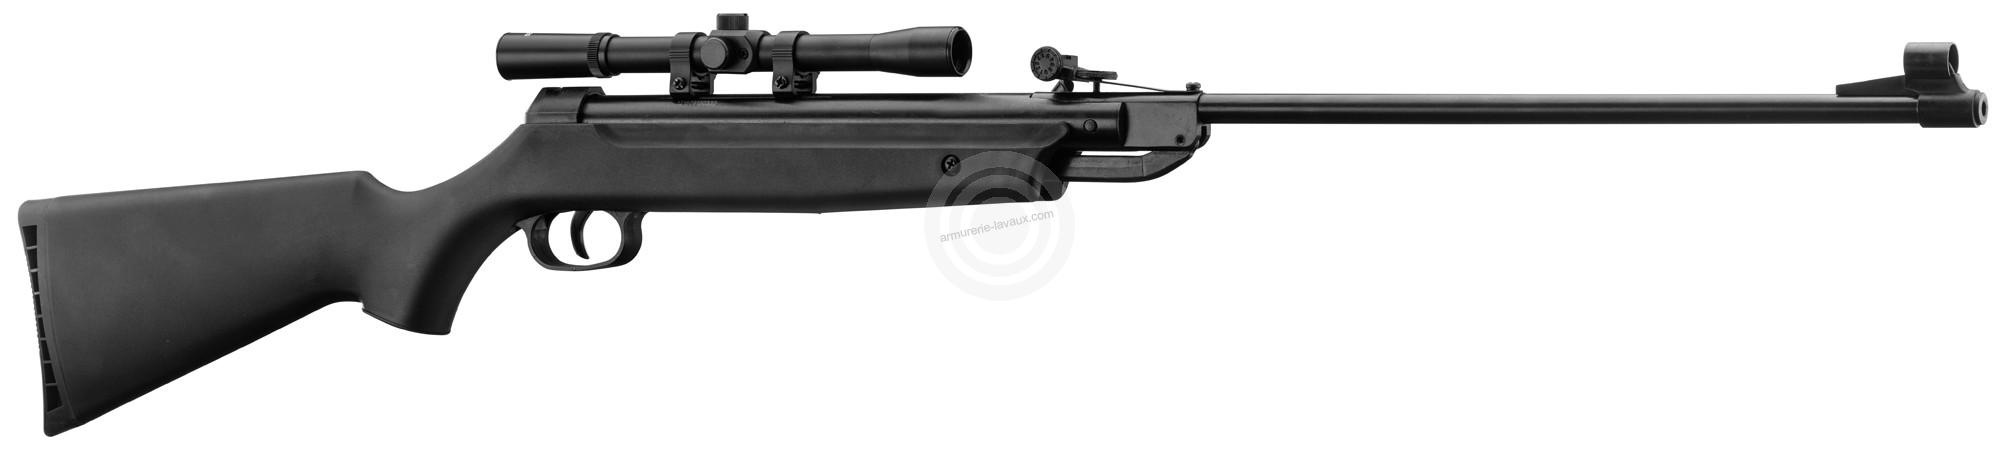 Carabine à plombs BEEMAN QB12 Cal.4,5 mm